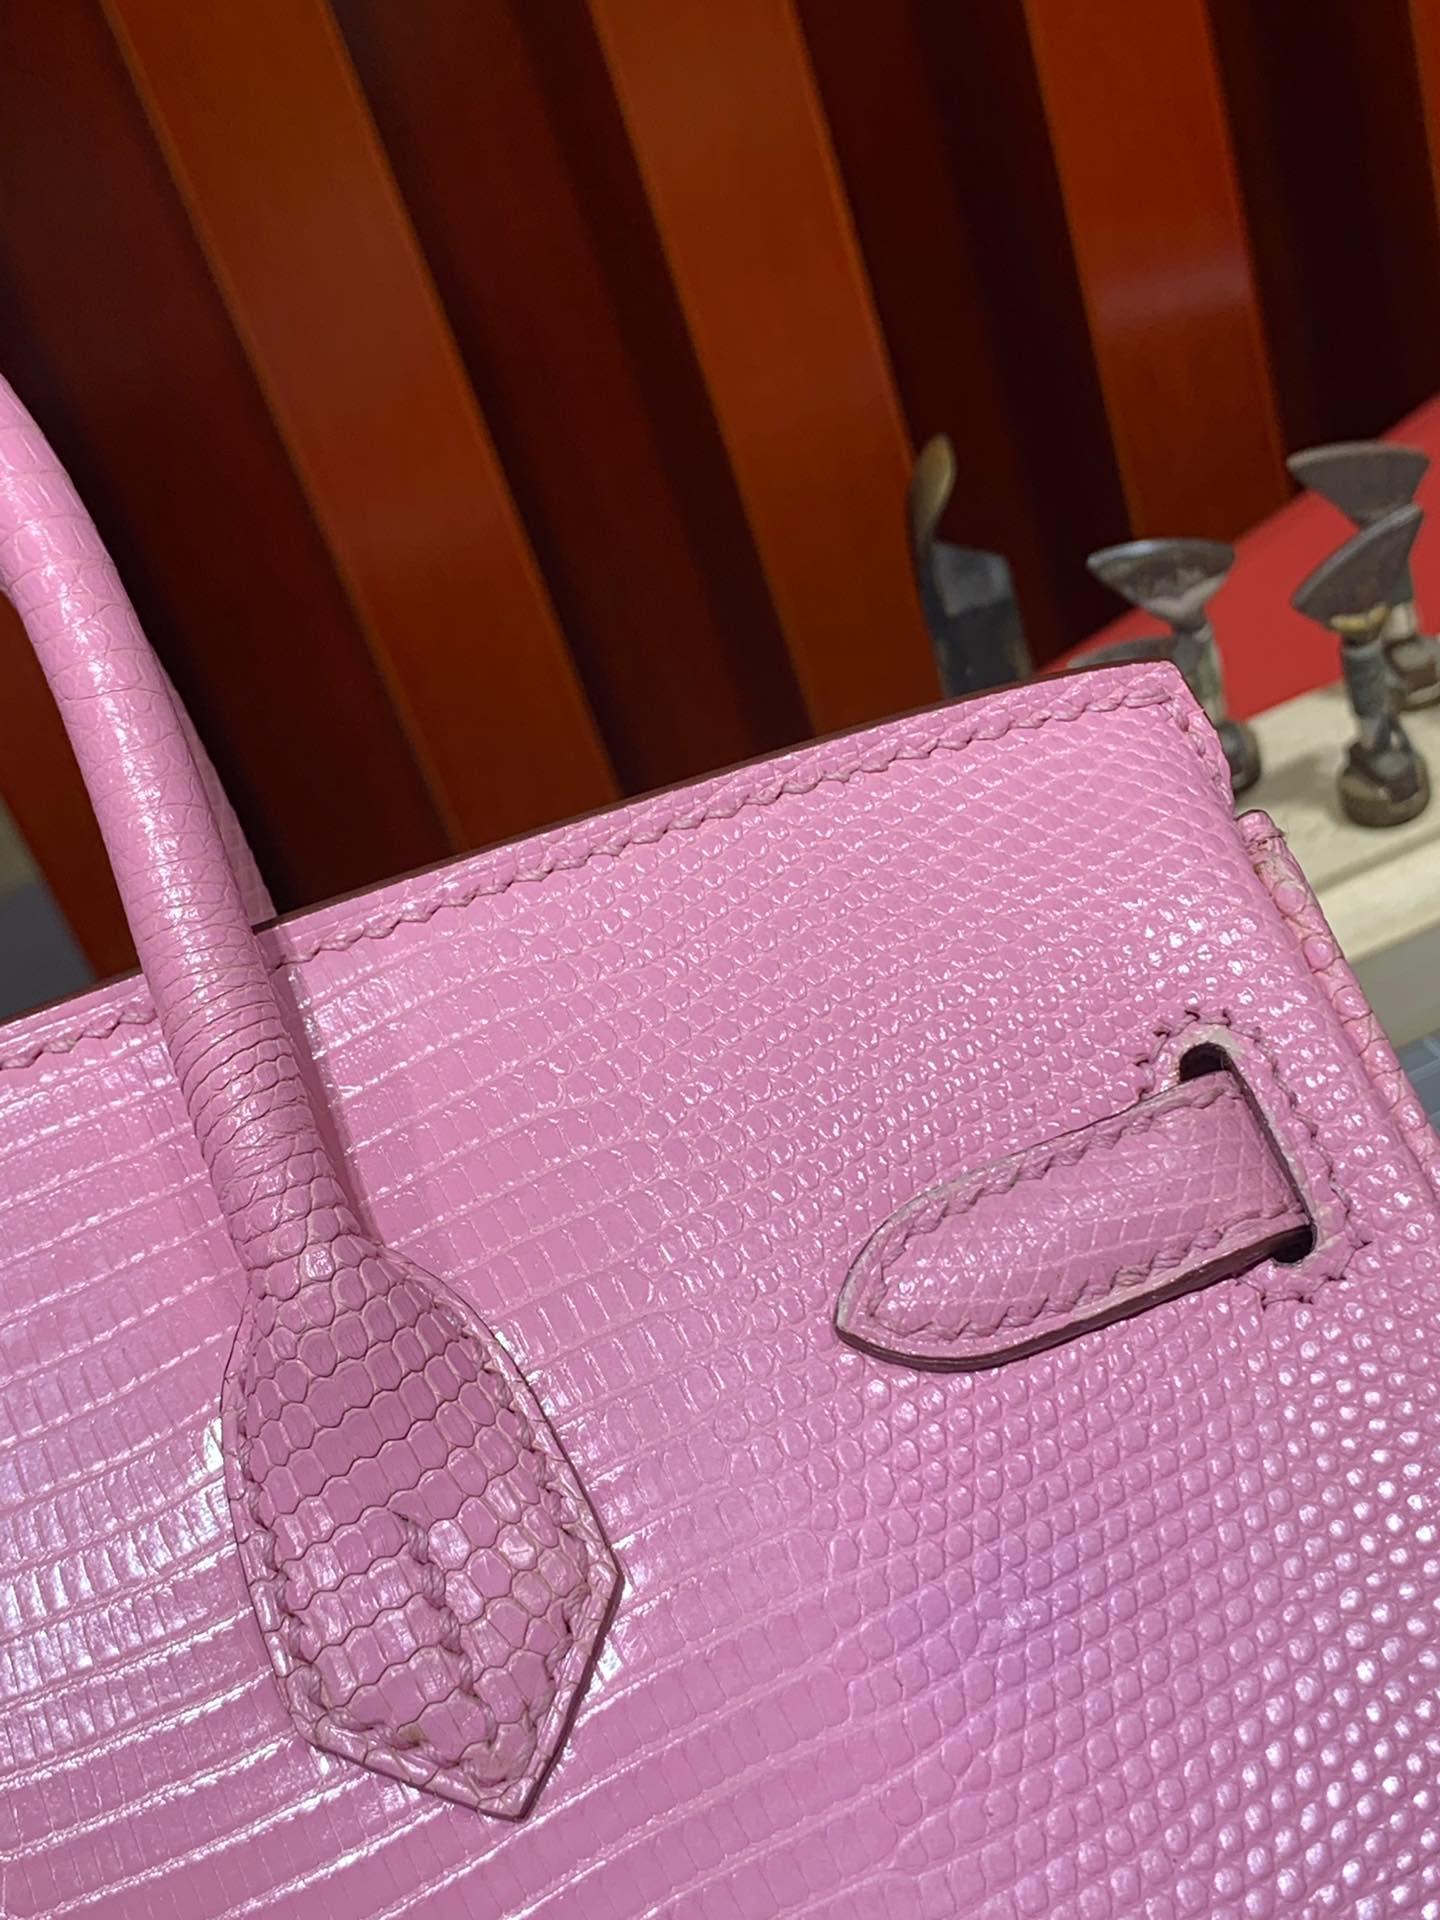 Hermes包包批发 爱马仕稀有动物皮蜥蜴皮铂金包Birkin30CM 樱花粉 金扣